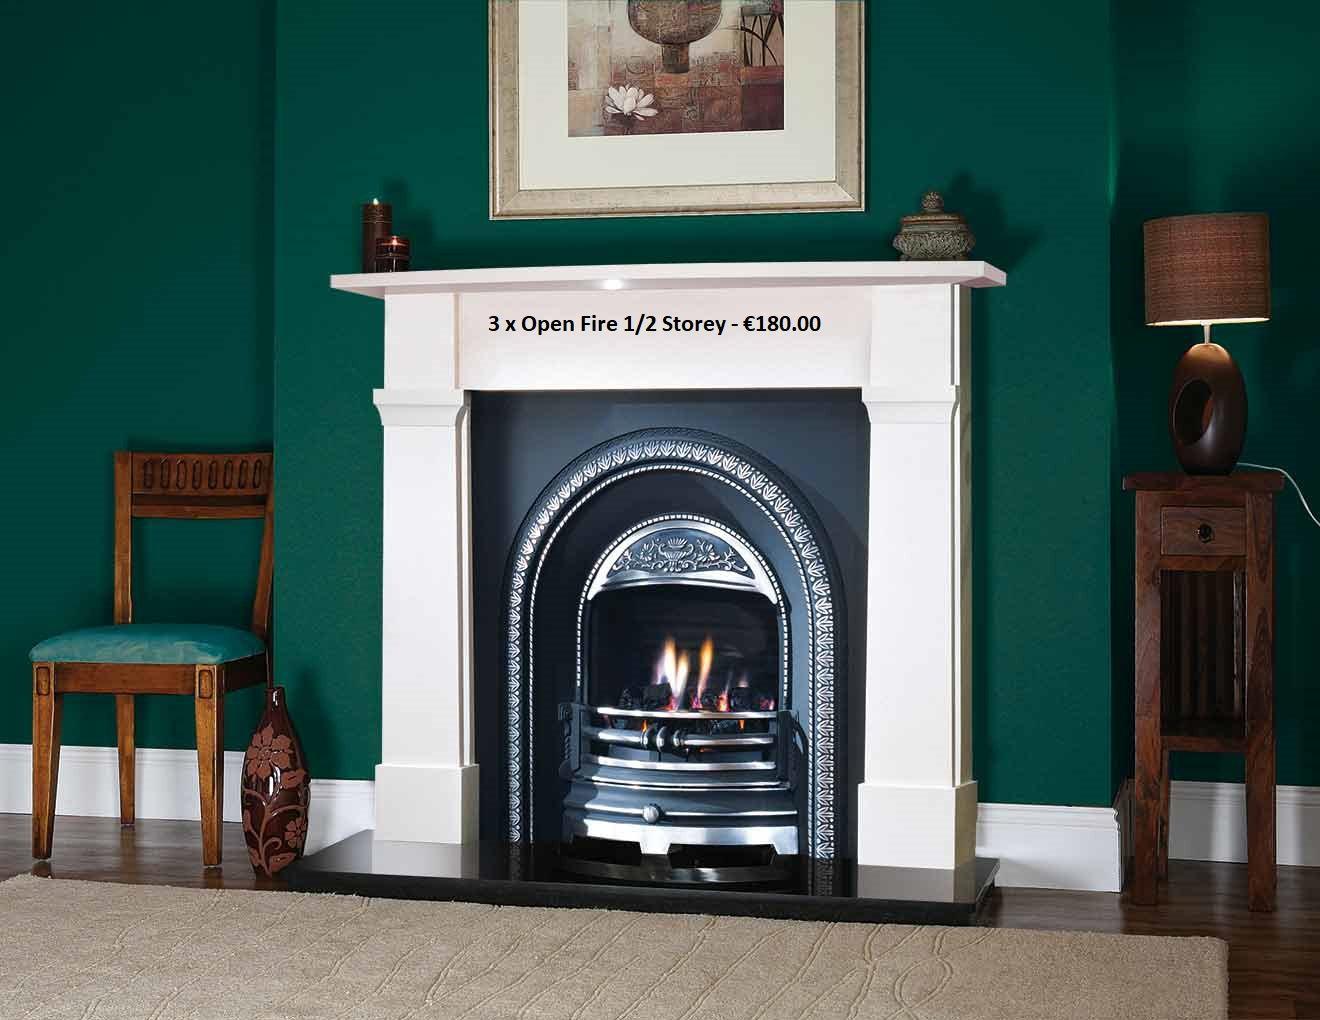 Chimney Sweep Open Fire 1/2 Storey x 3